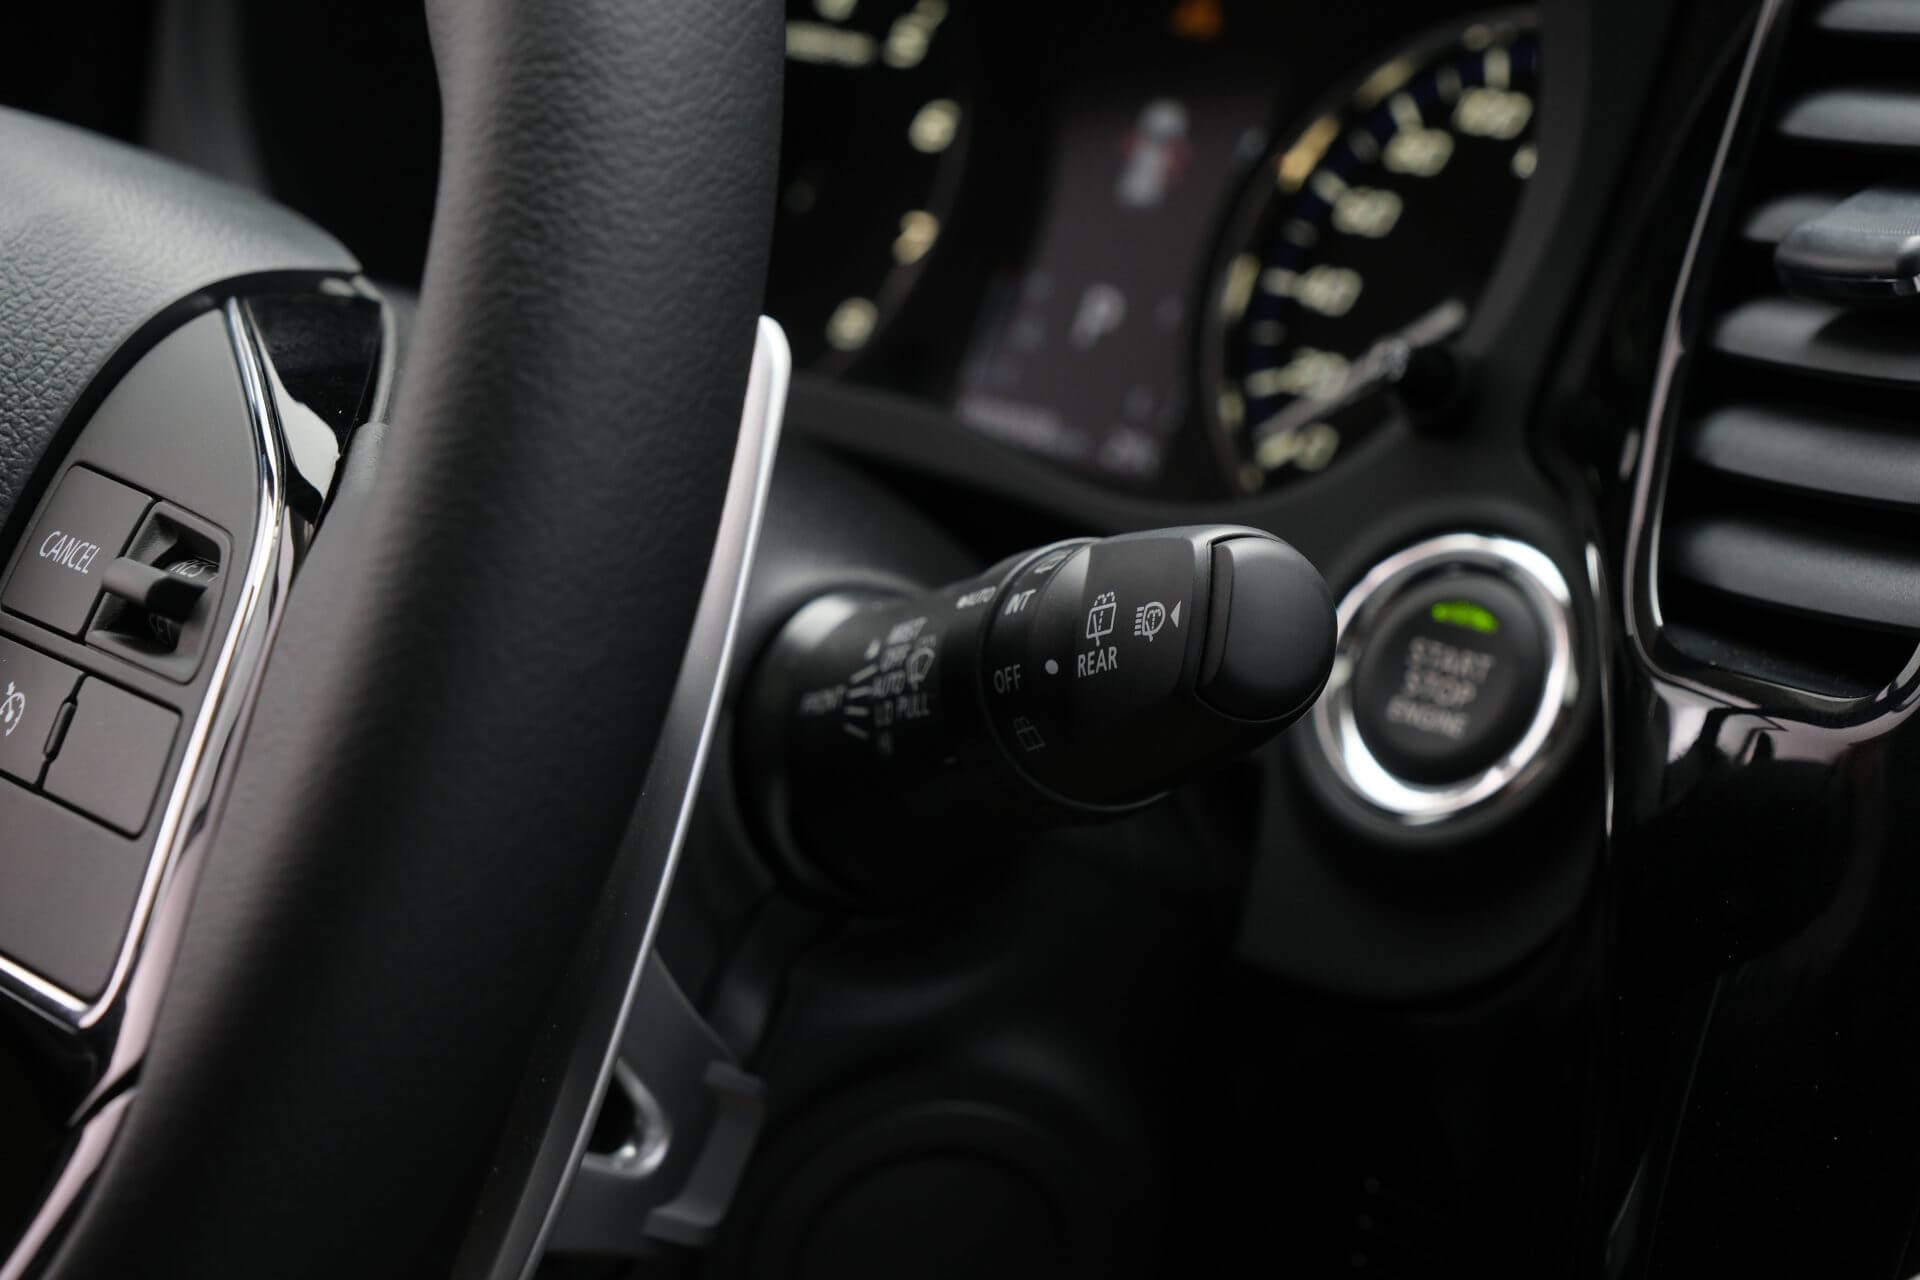 https://www.mitsubishi-motors.com.vn/w/wp-content/uploads/2020/02/DSCF5242.jpg